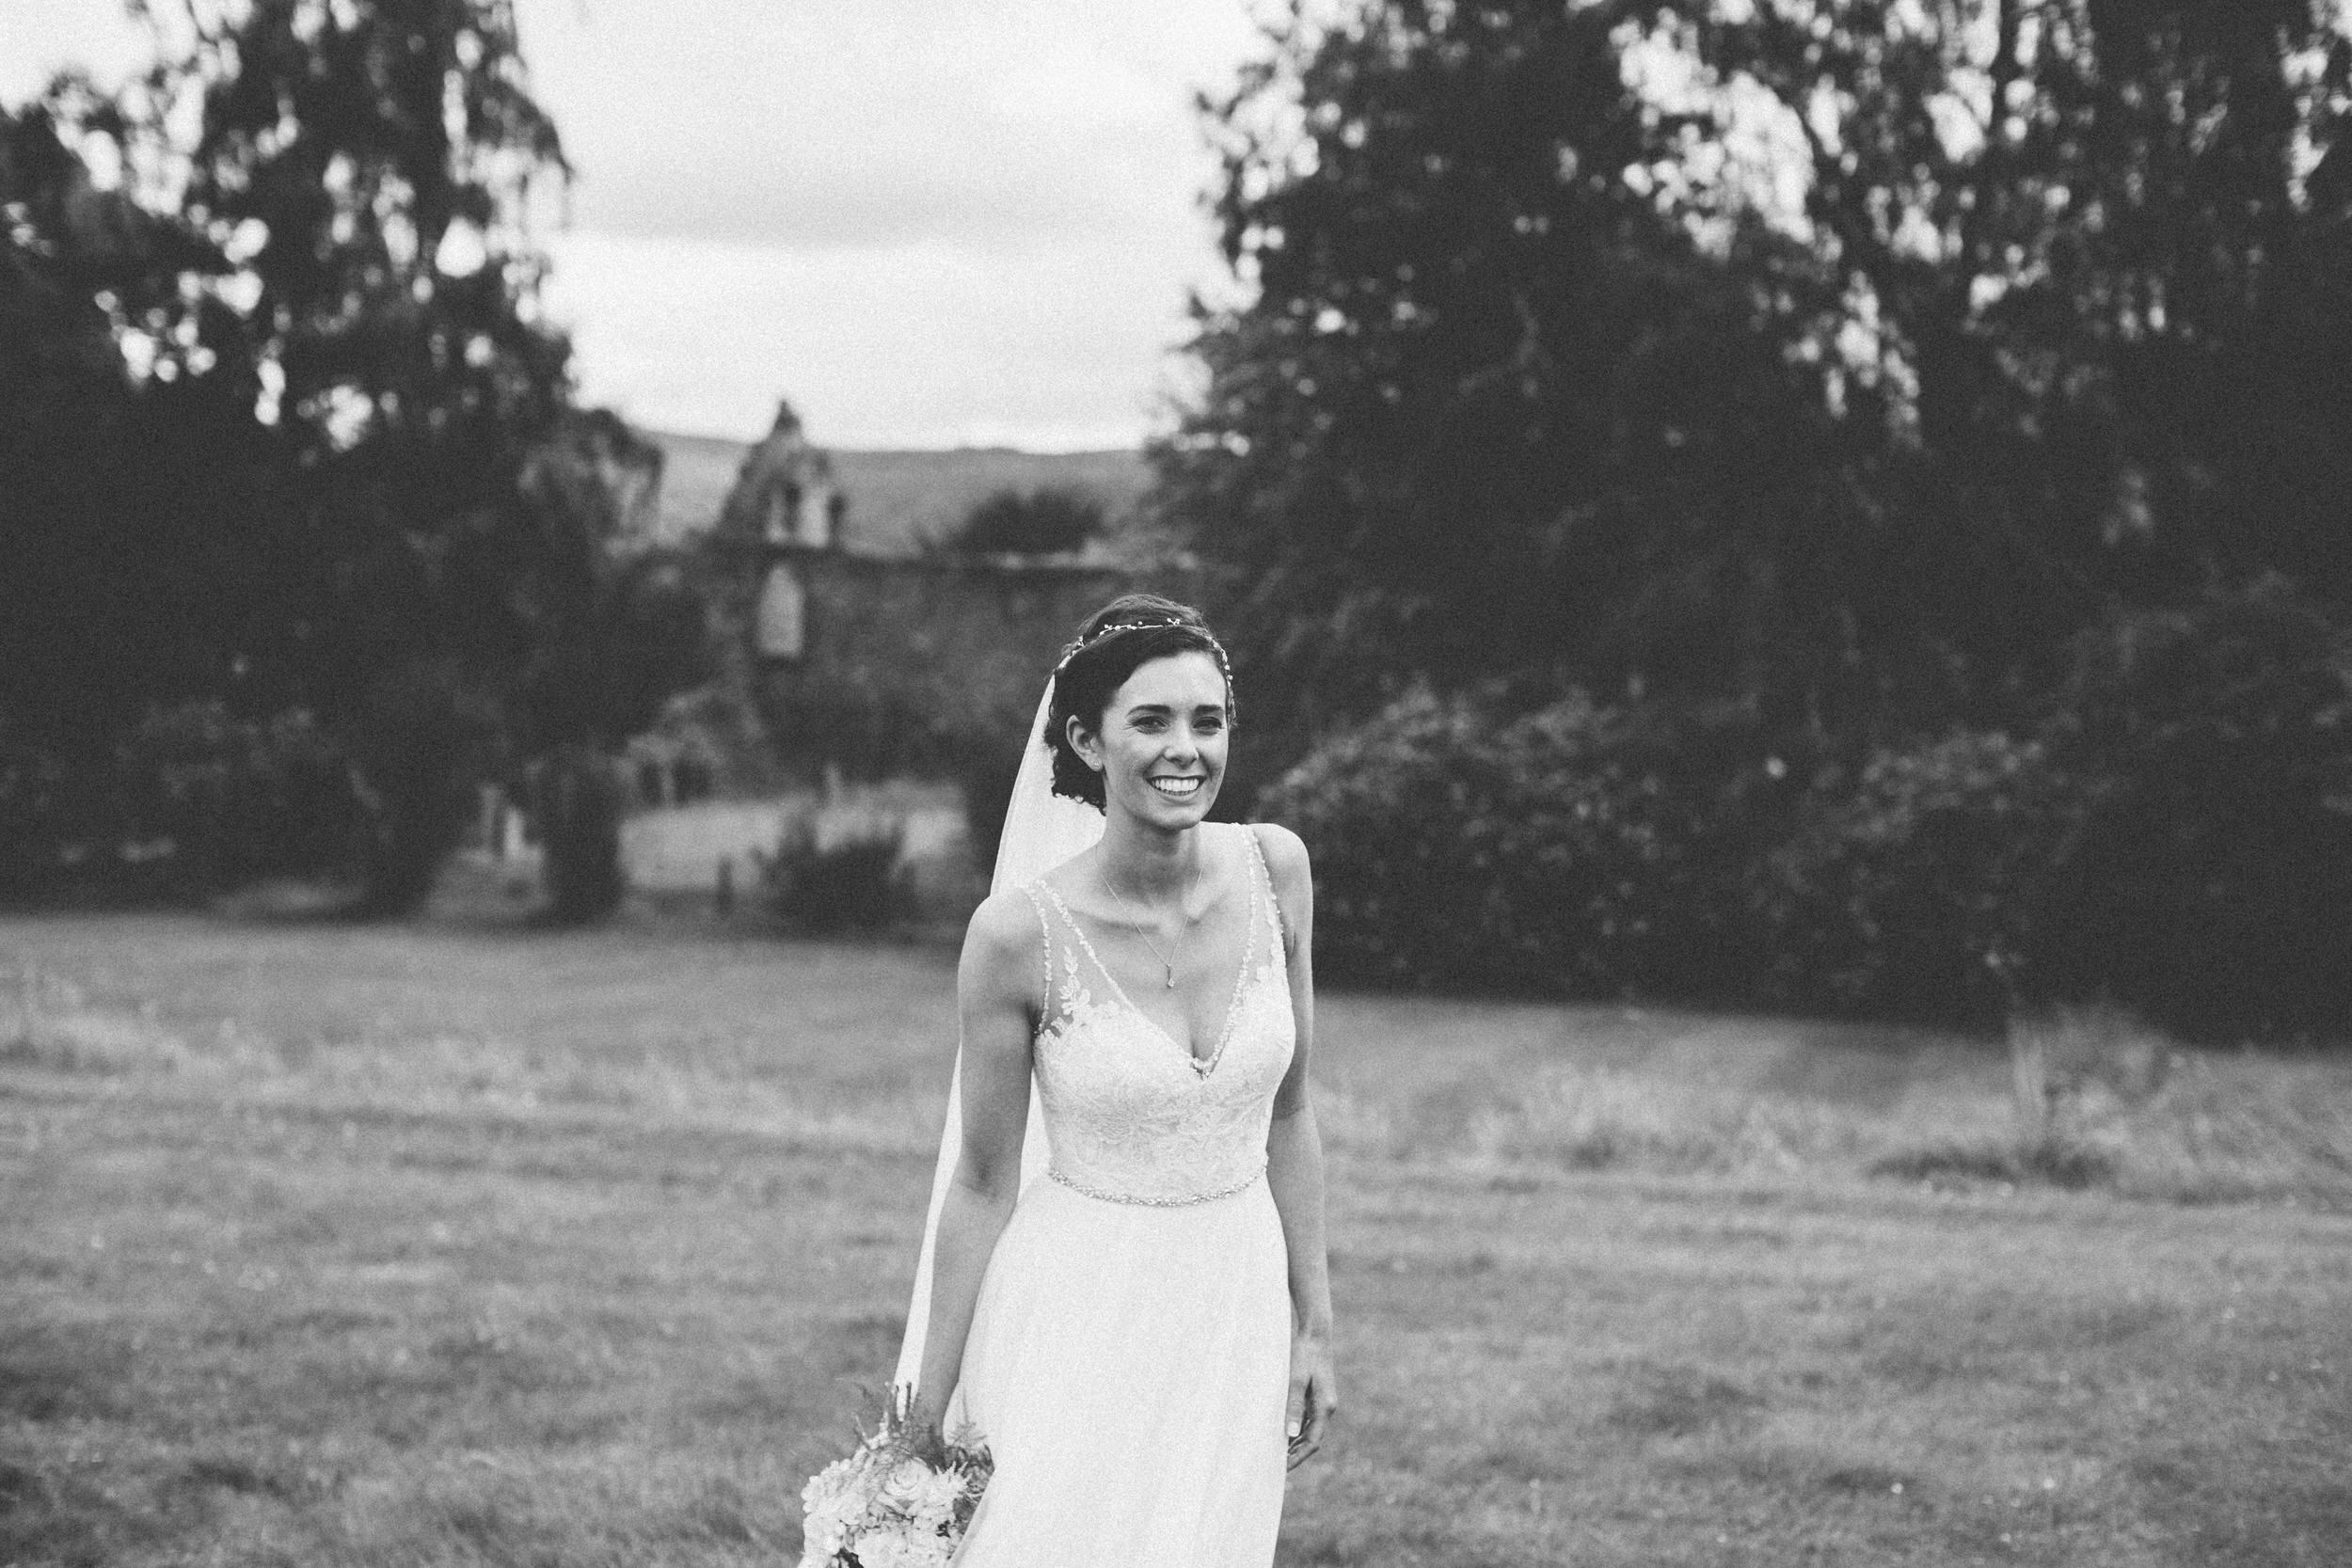 Quirky Wedding Photographer Scotland Glasgow Edinburgh Mirrorbox 172.jpg